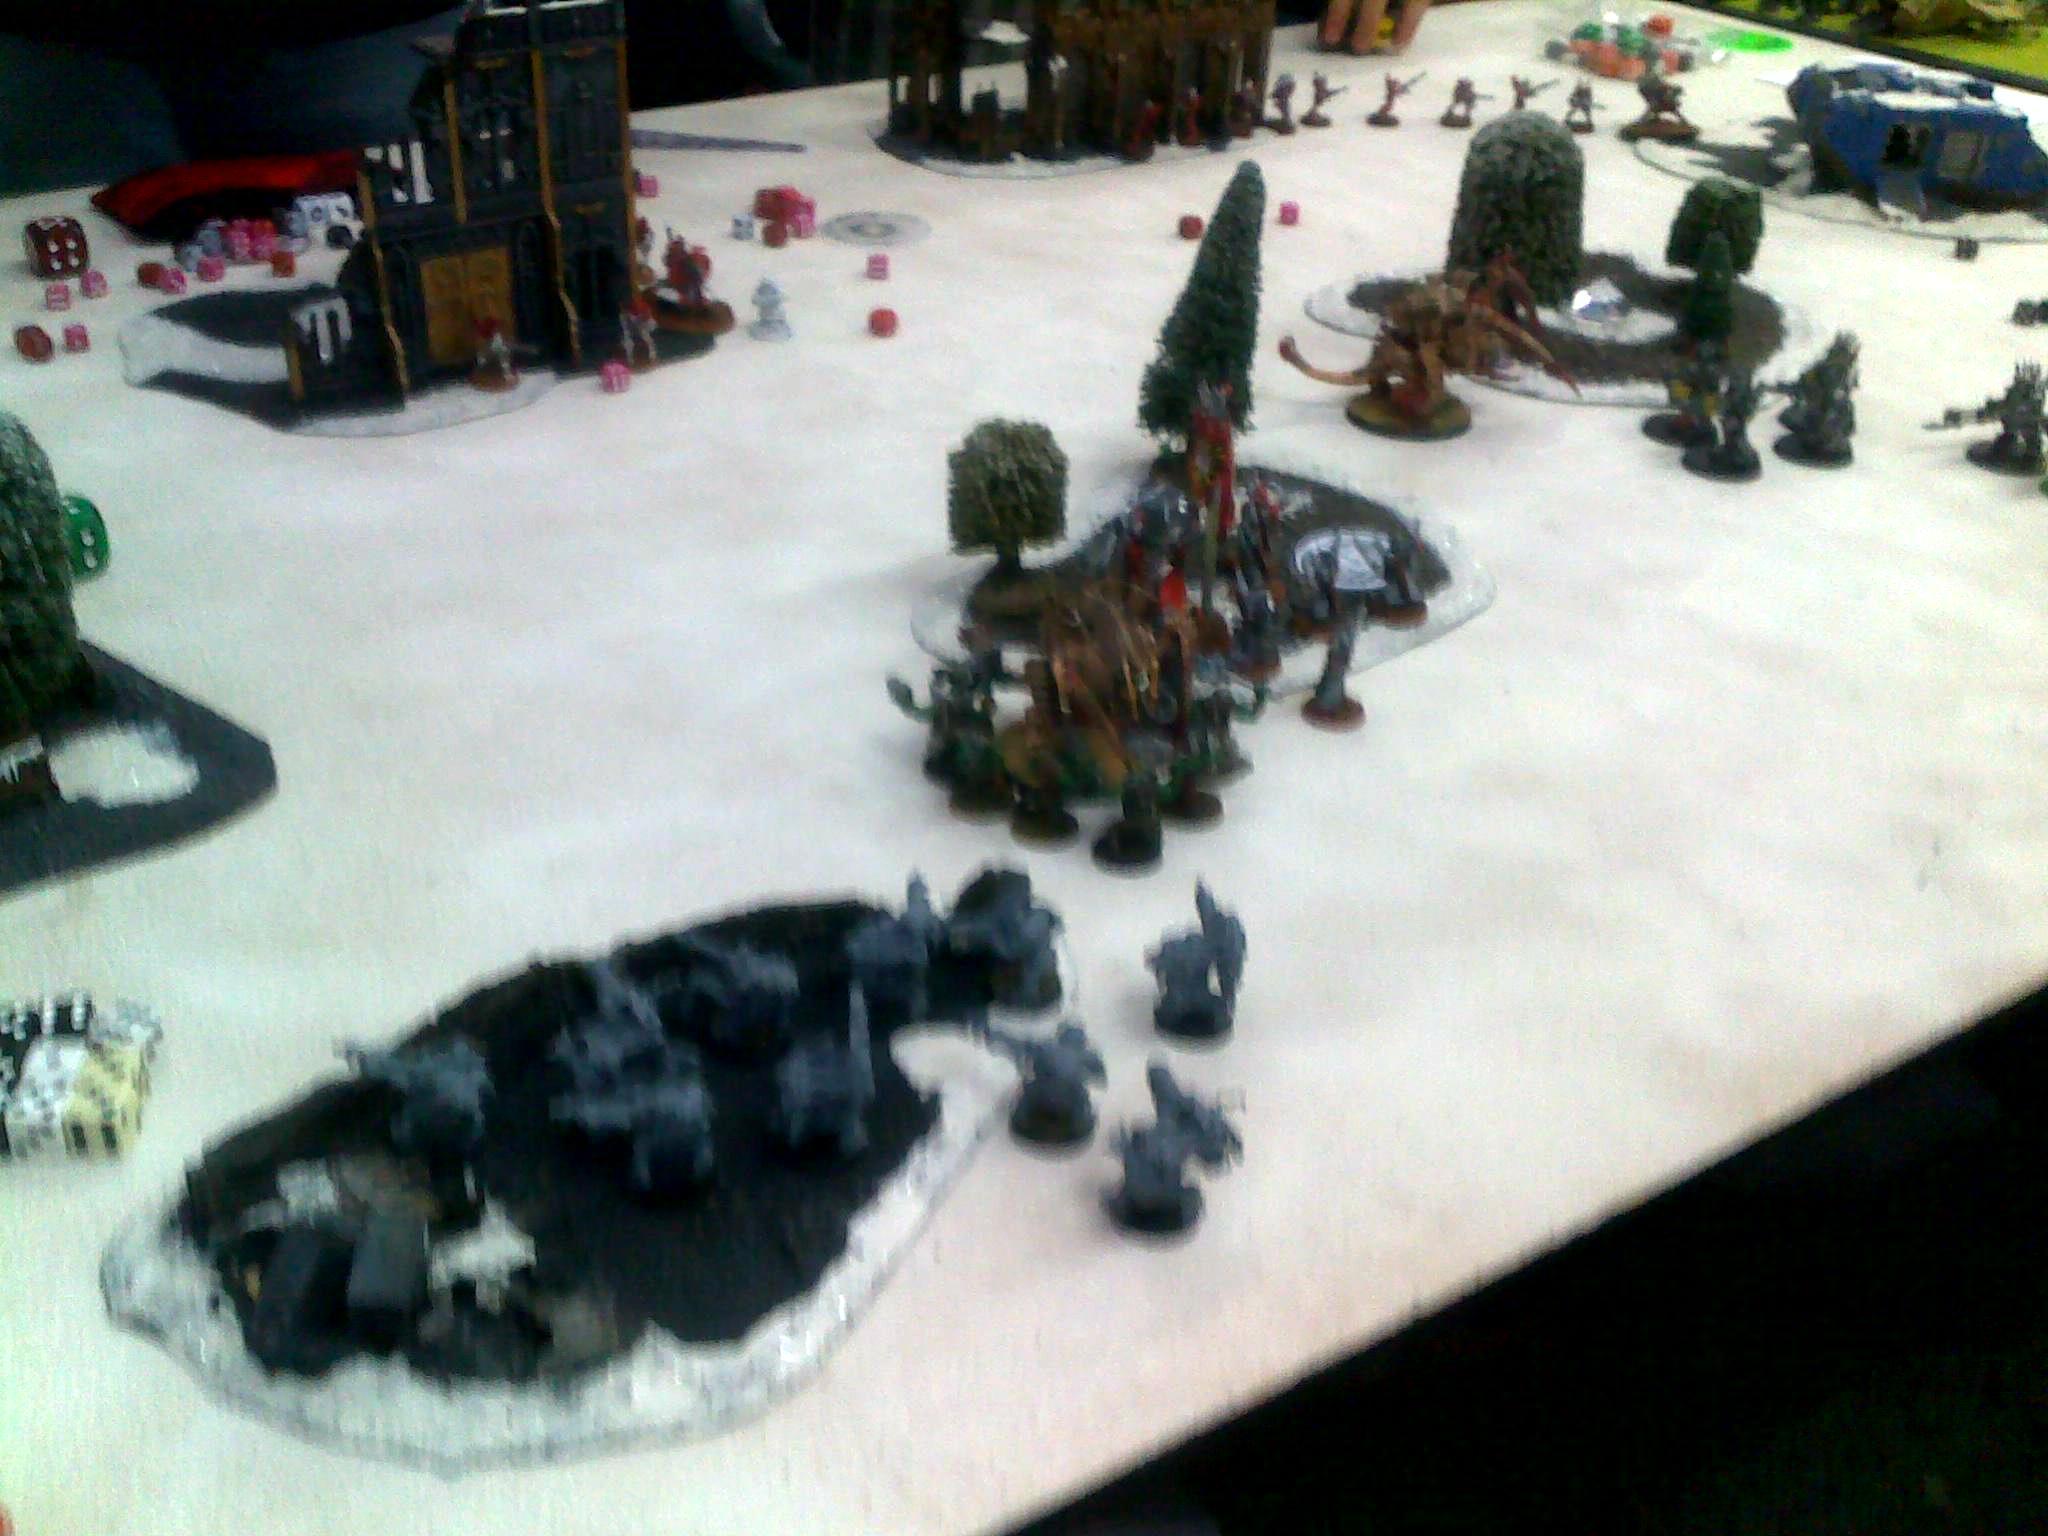 Ork/Chaos vs Eldar/Tyranids